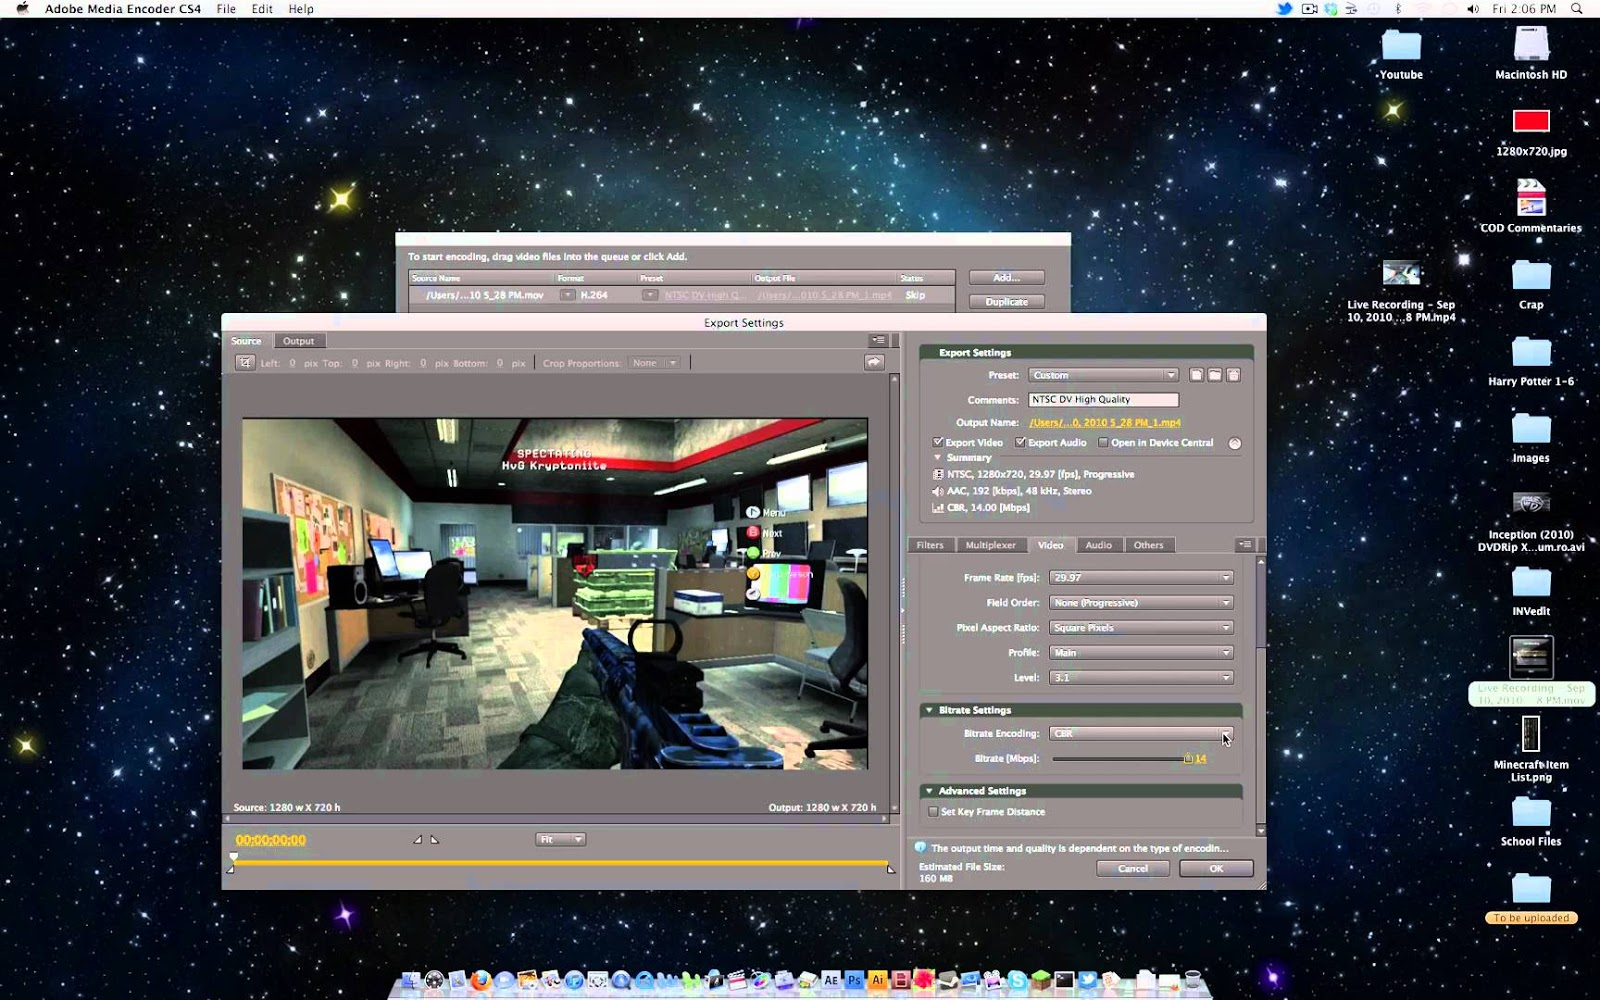 Adobe Media Encoder Update 32-bit - Free download